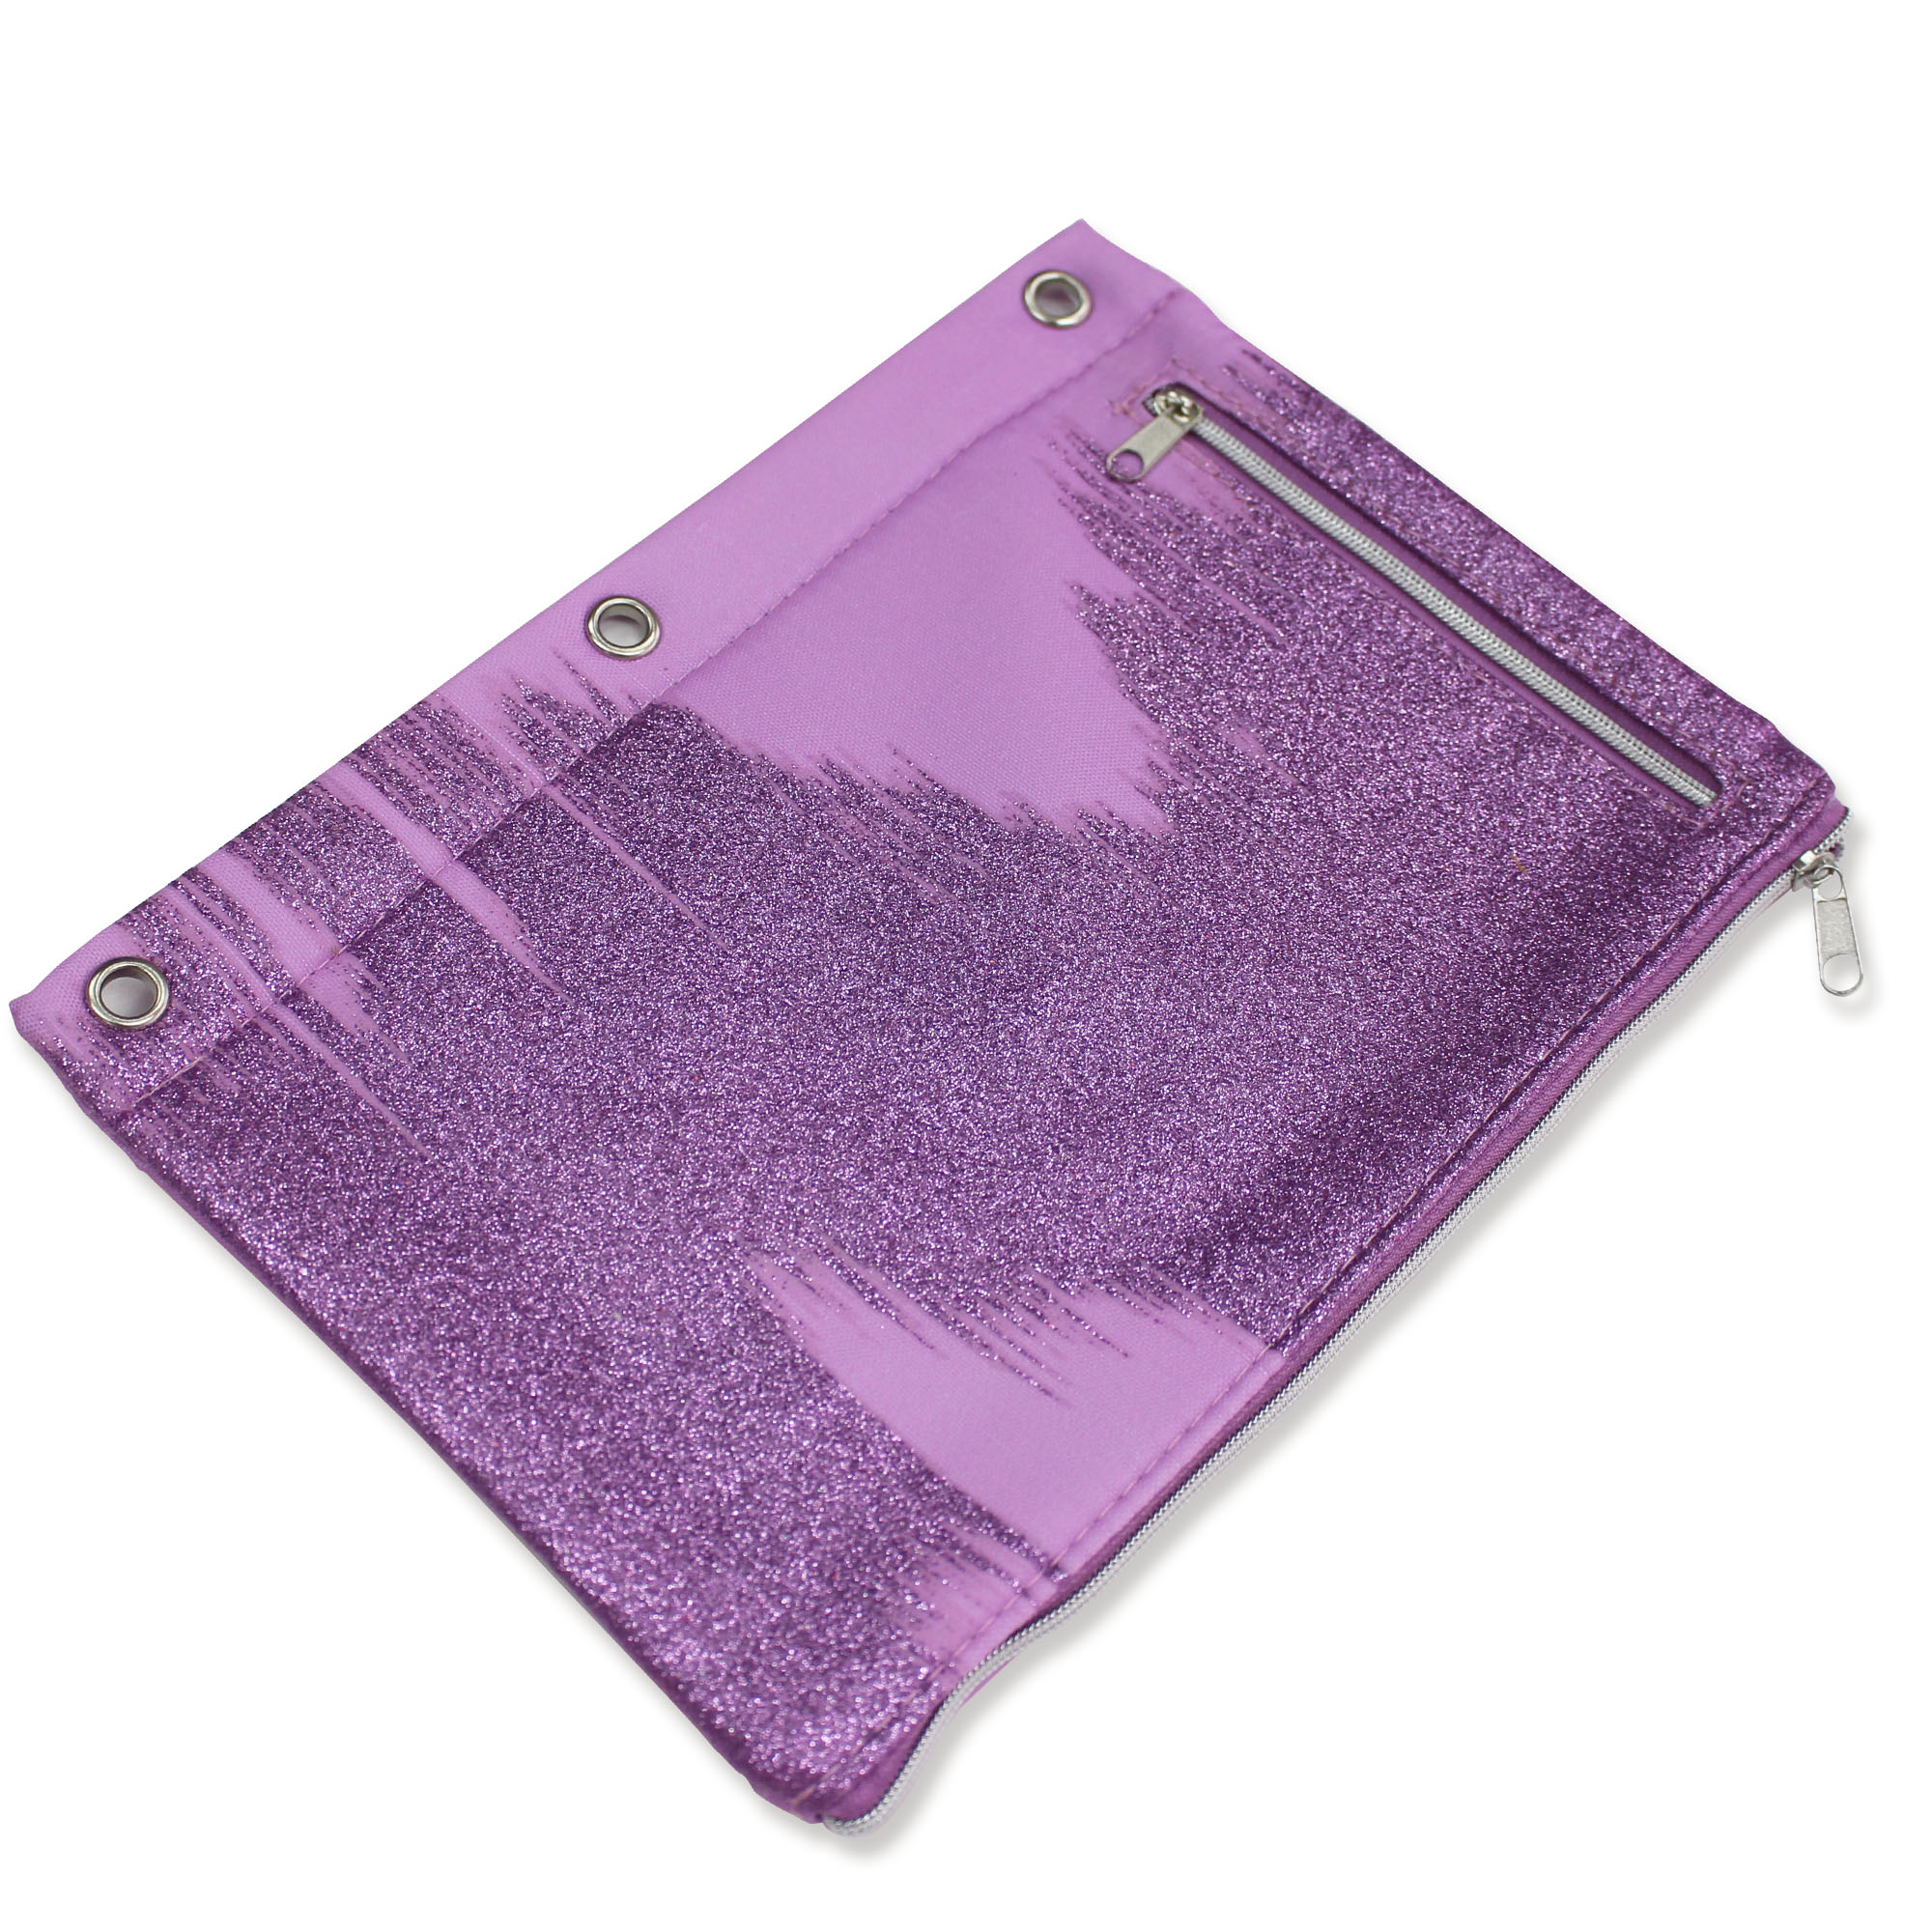 U Style Glitter Splash 3 Ring Binder Pencil Pouch, Violet with Glitter